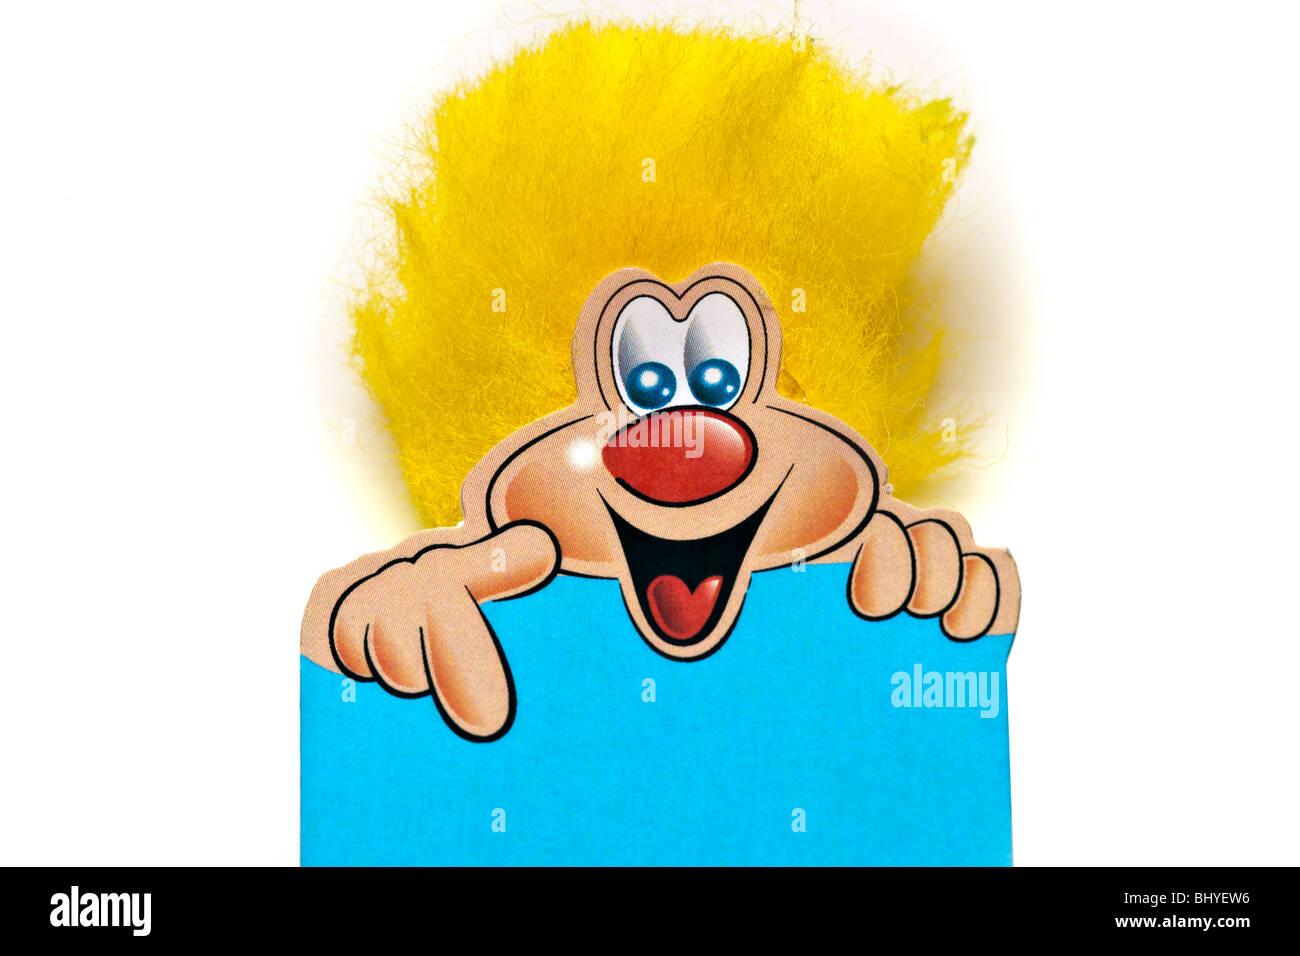 Lächelnd, gelbe buschig behaart Cartoon Charakter nach unten zeigt. Stockbild